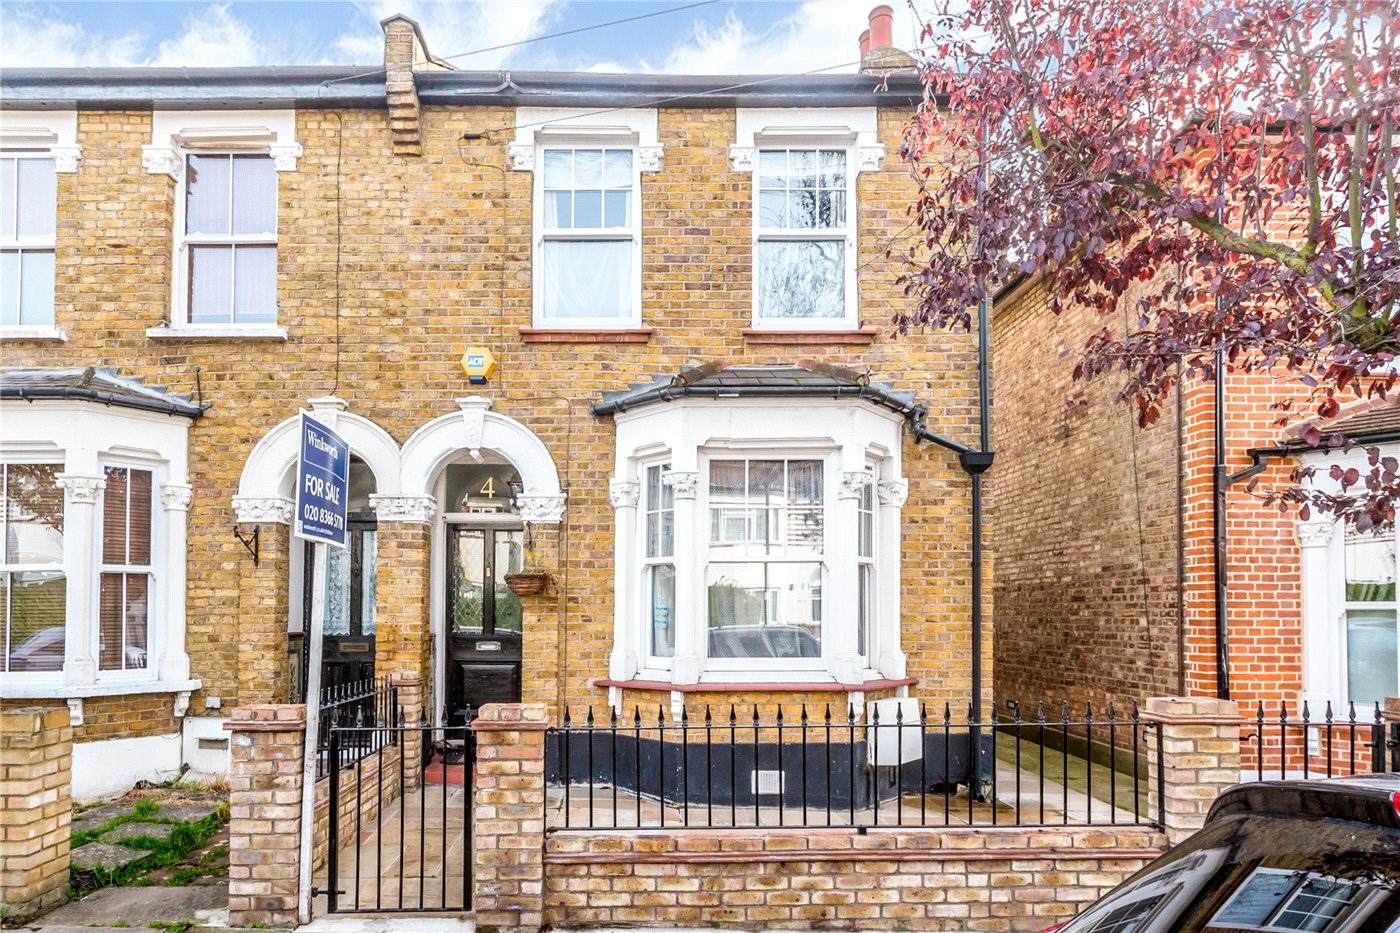 4 Bedrooms Semi Detached House for sale in Fotheringham Road, Enfield, EN1